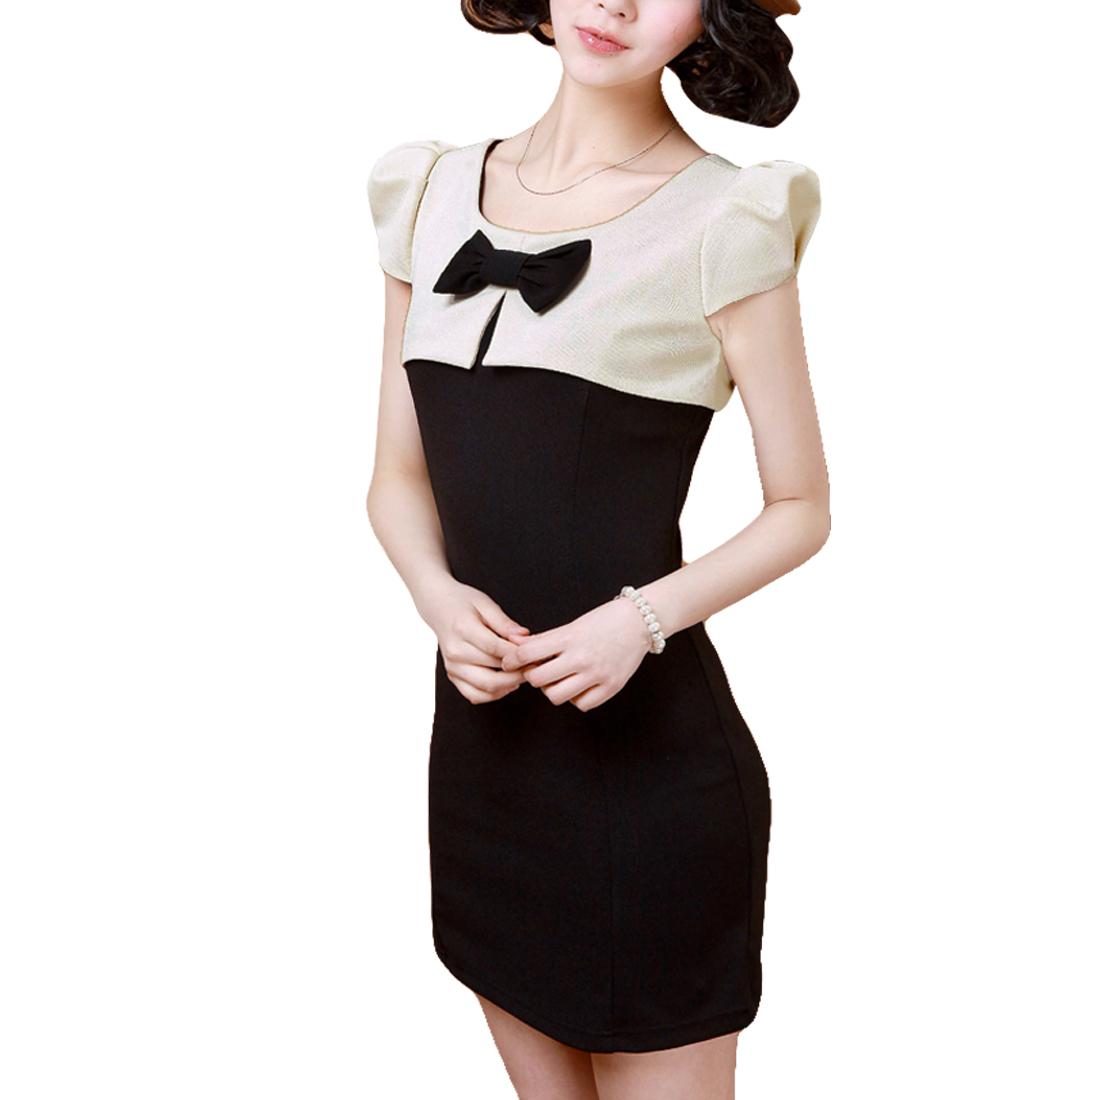 Women Cap Sleeves Contrast Color Bodycon Dress Beige Black S